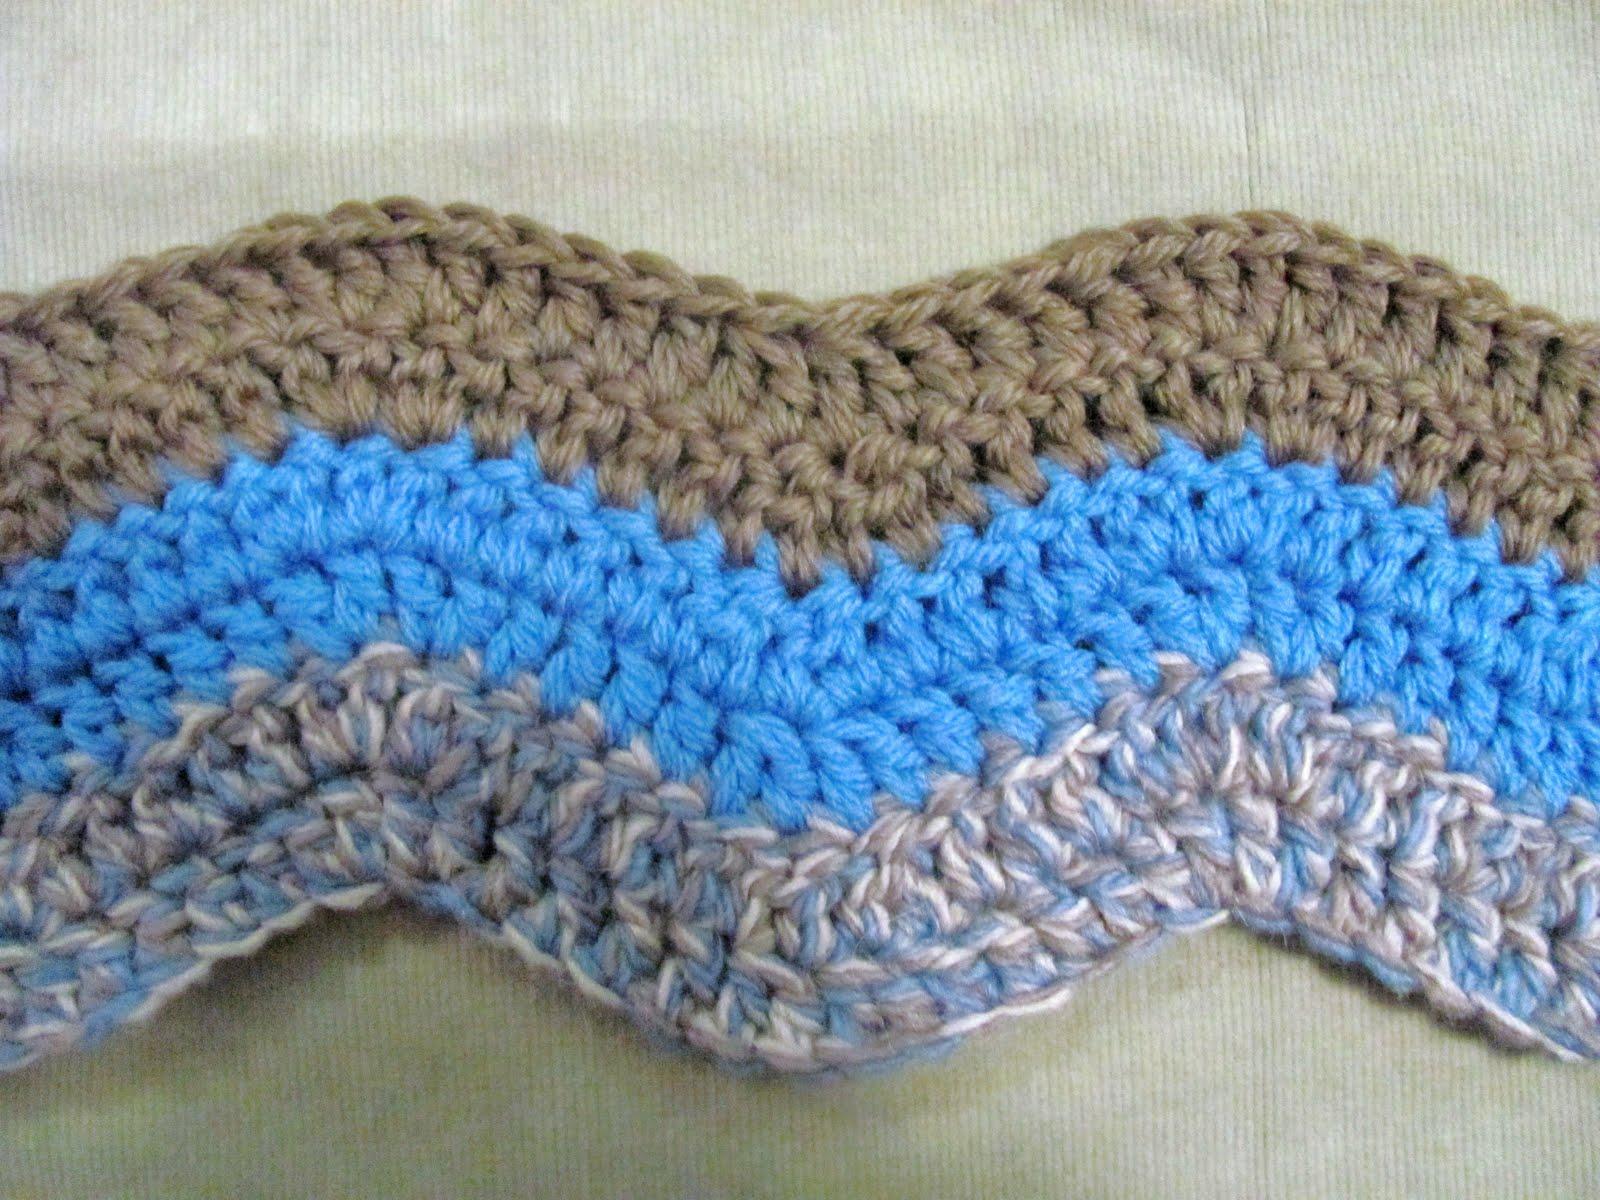 Single crochet ripple afghan pattern free squareone for crochet ripple pattern crochet projects single crochet ripple afghan pattern free bankloansurffo Images